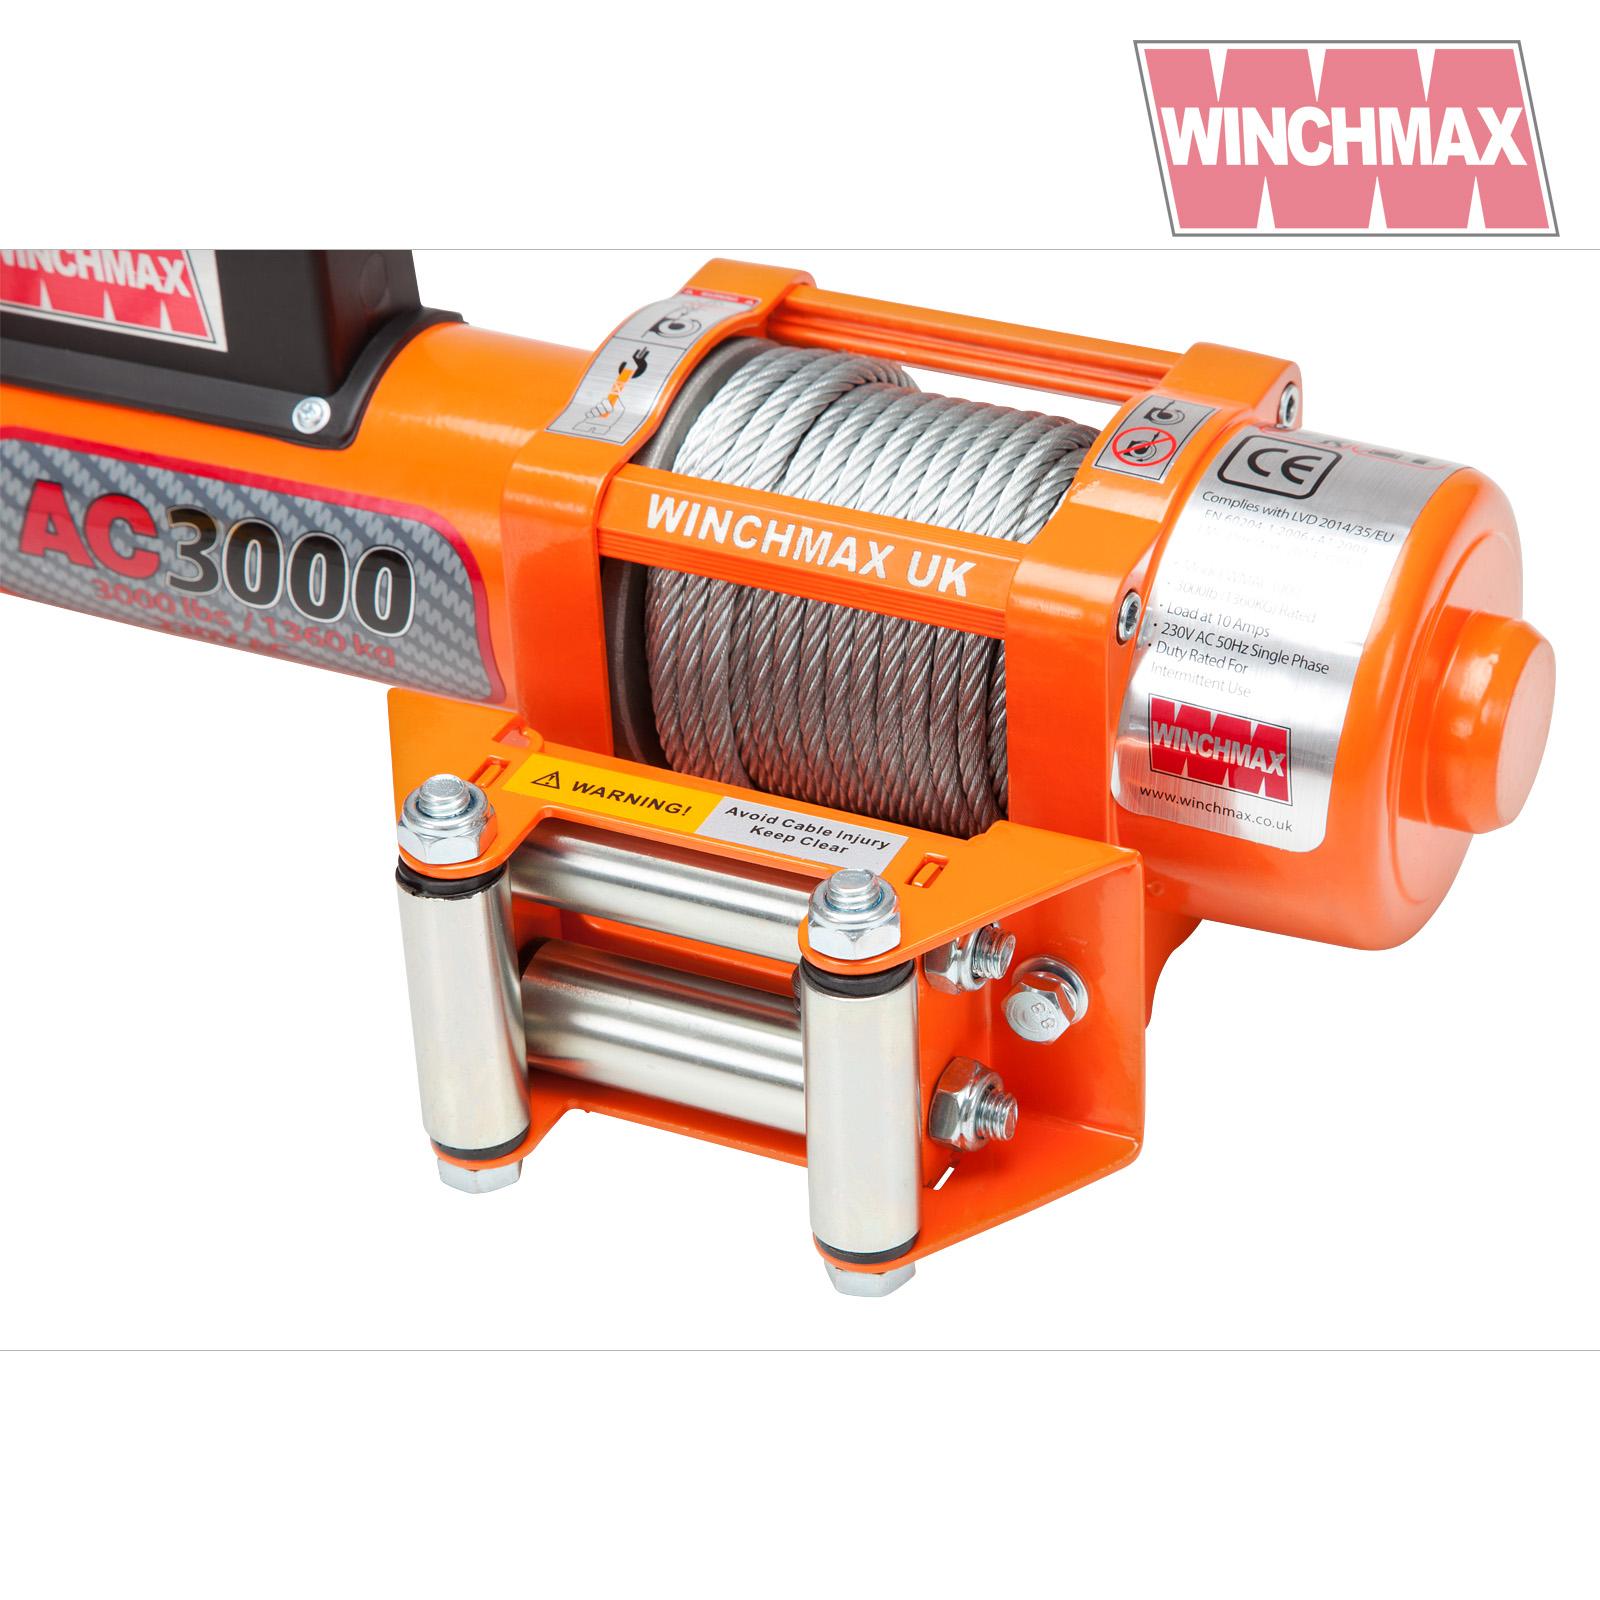 Wmac3000 winchmax 250